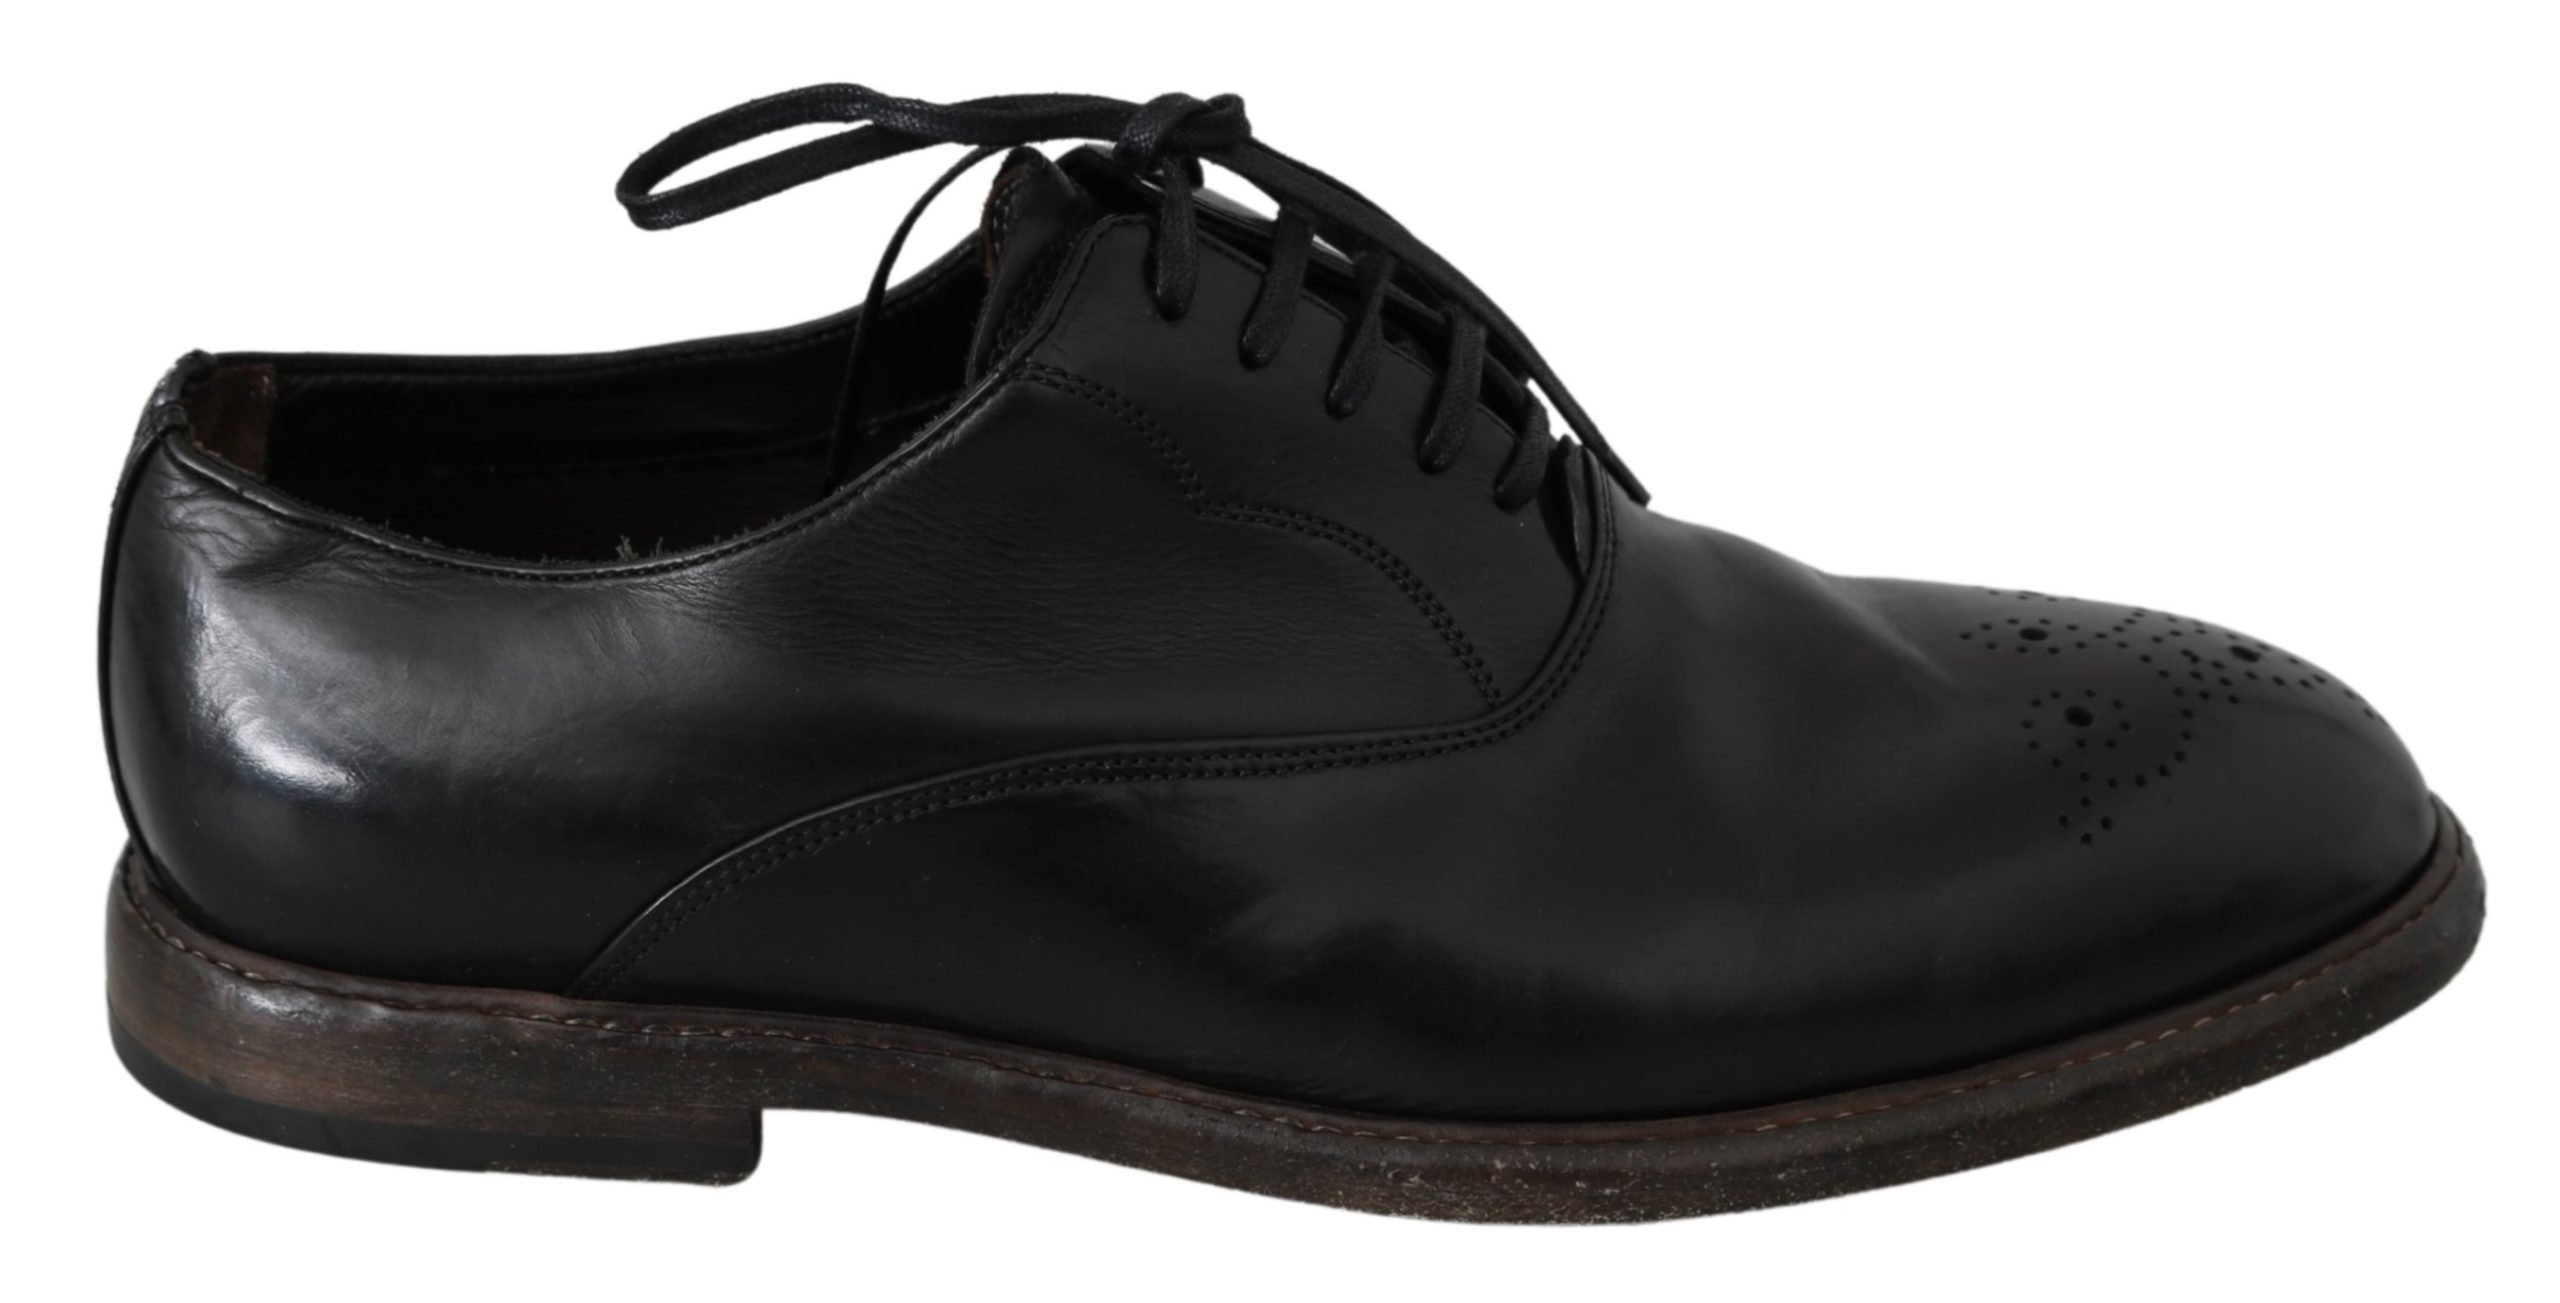 Dolce & Gabbana Men's Leather Formal Brogue Shoe Black MV2777 - EU42/US9